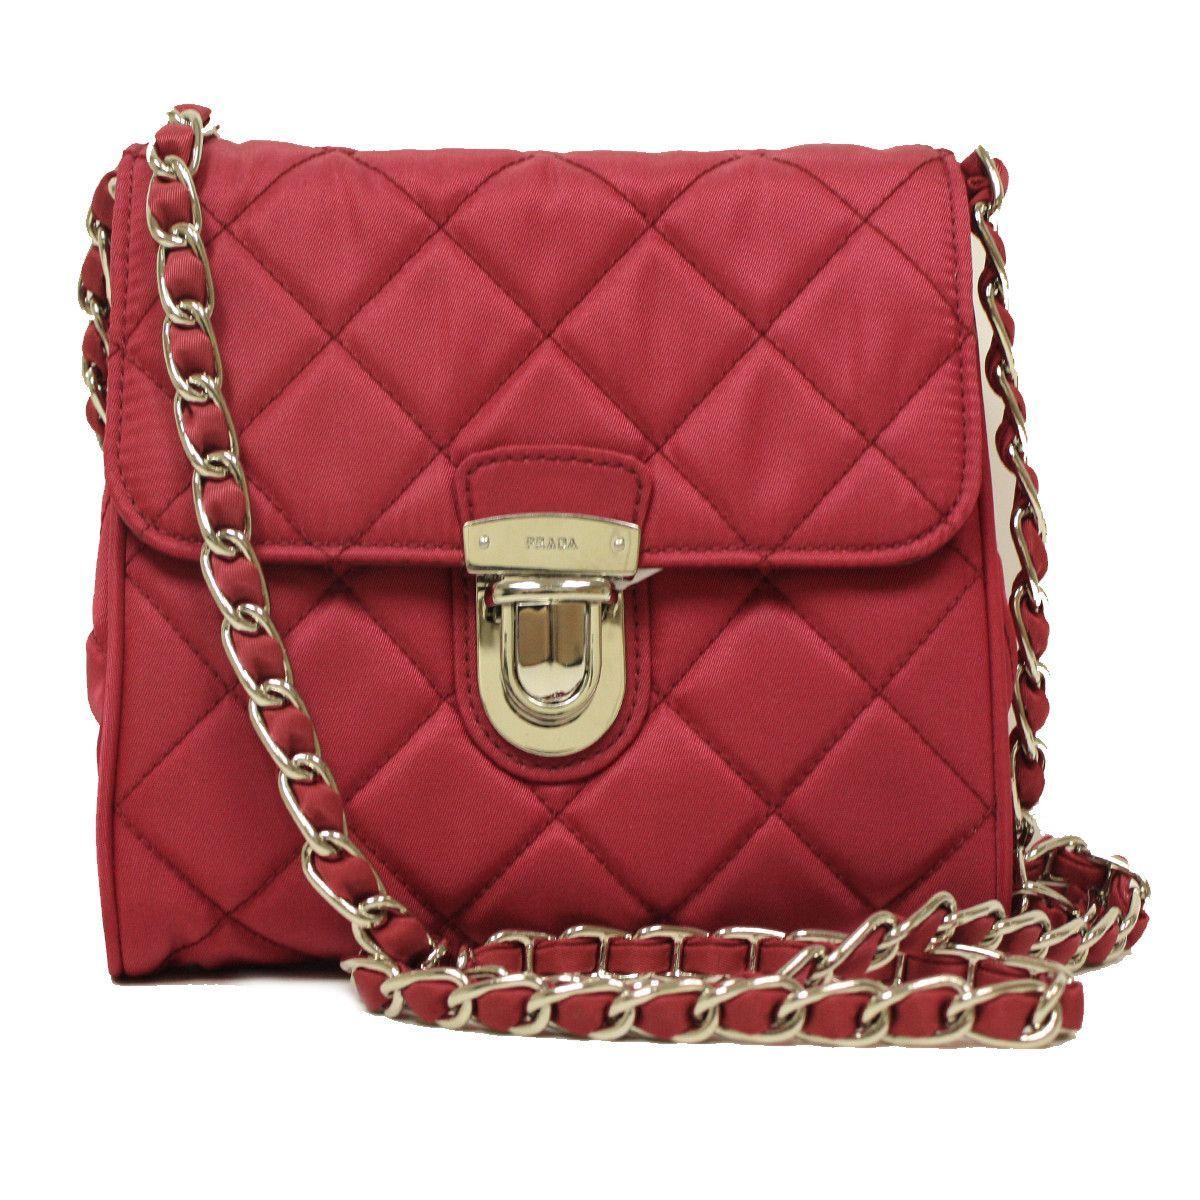 59f7061b6fcd Prada Pink Tessuto Impuntu Pattina Leather Chain Crossbody Bag ...